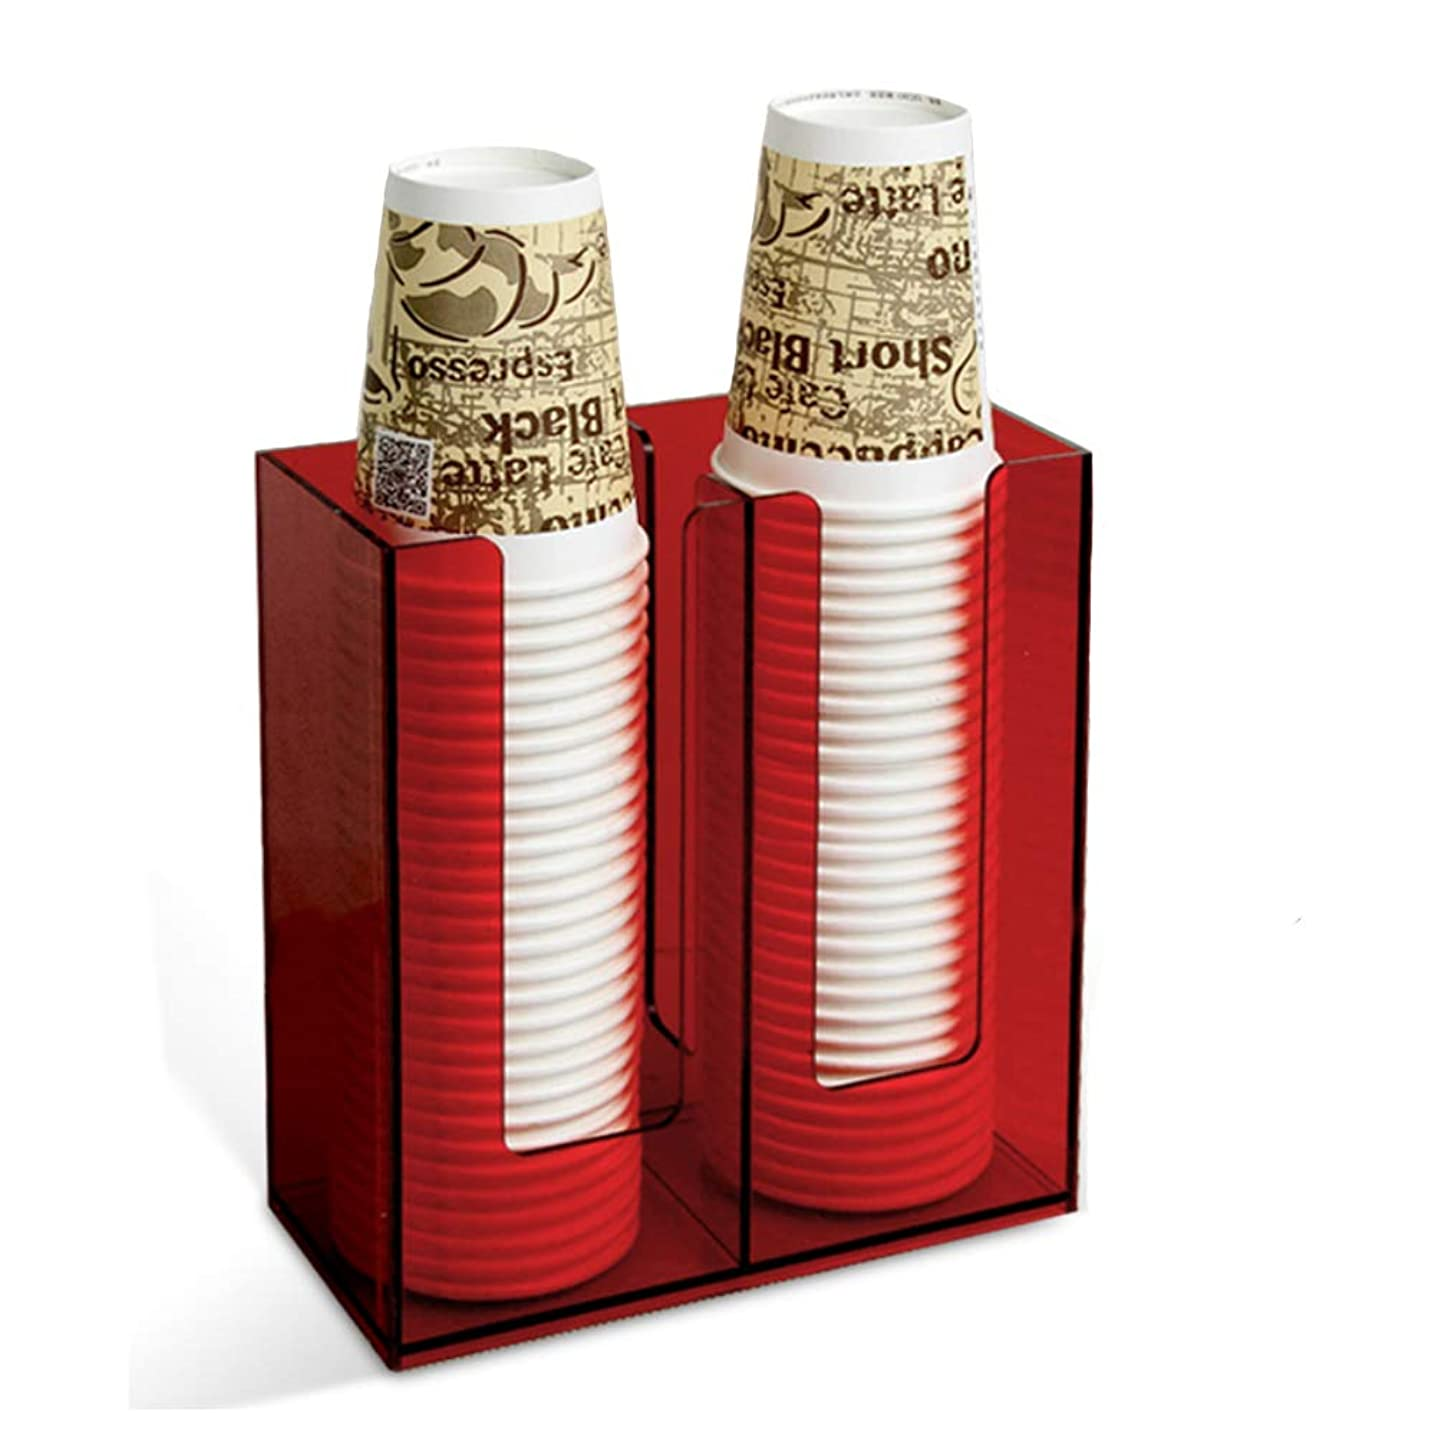 Holyo カップディスペンサー 使い捨てカップ棚 コーヒーカップ収納 紙コップホルダー コンビニ、ビュッフェ、オフィスなど適用 アクリル製 紙カップディスペンサー (レッド)